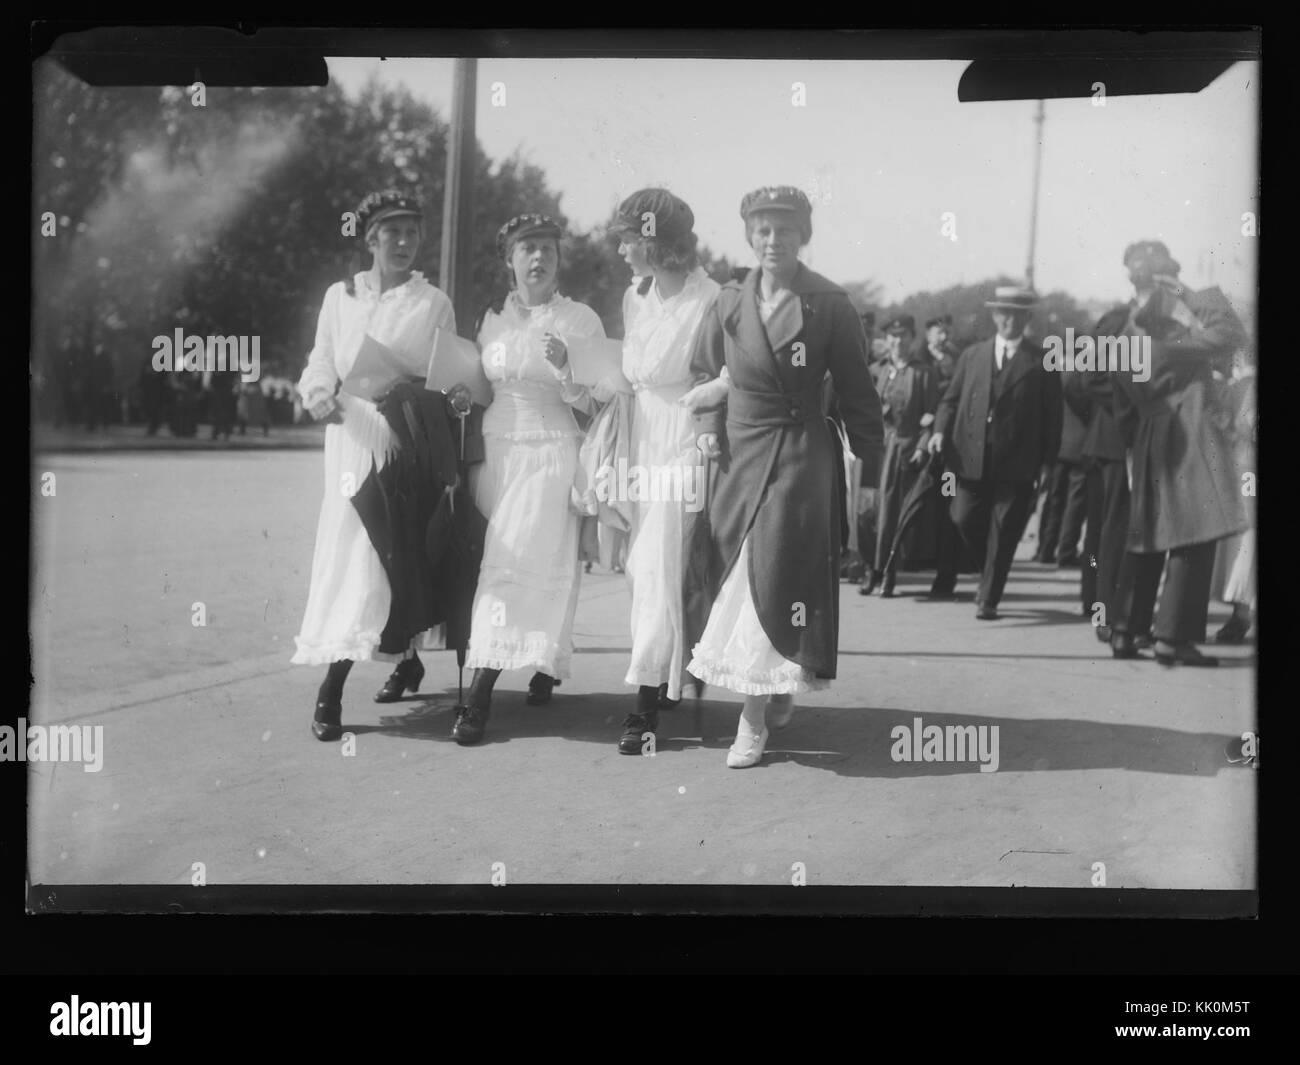 Studenterdagen 2den sept 1916   no nb digifoto 20160330 00130 NB NS NM 09743 - Stock Image